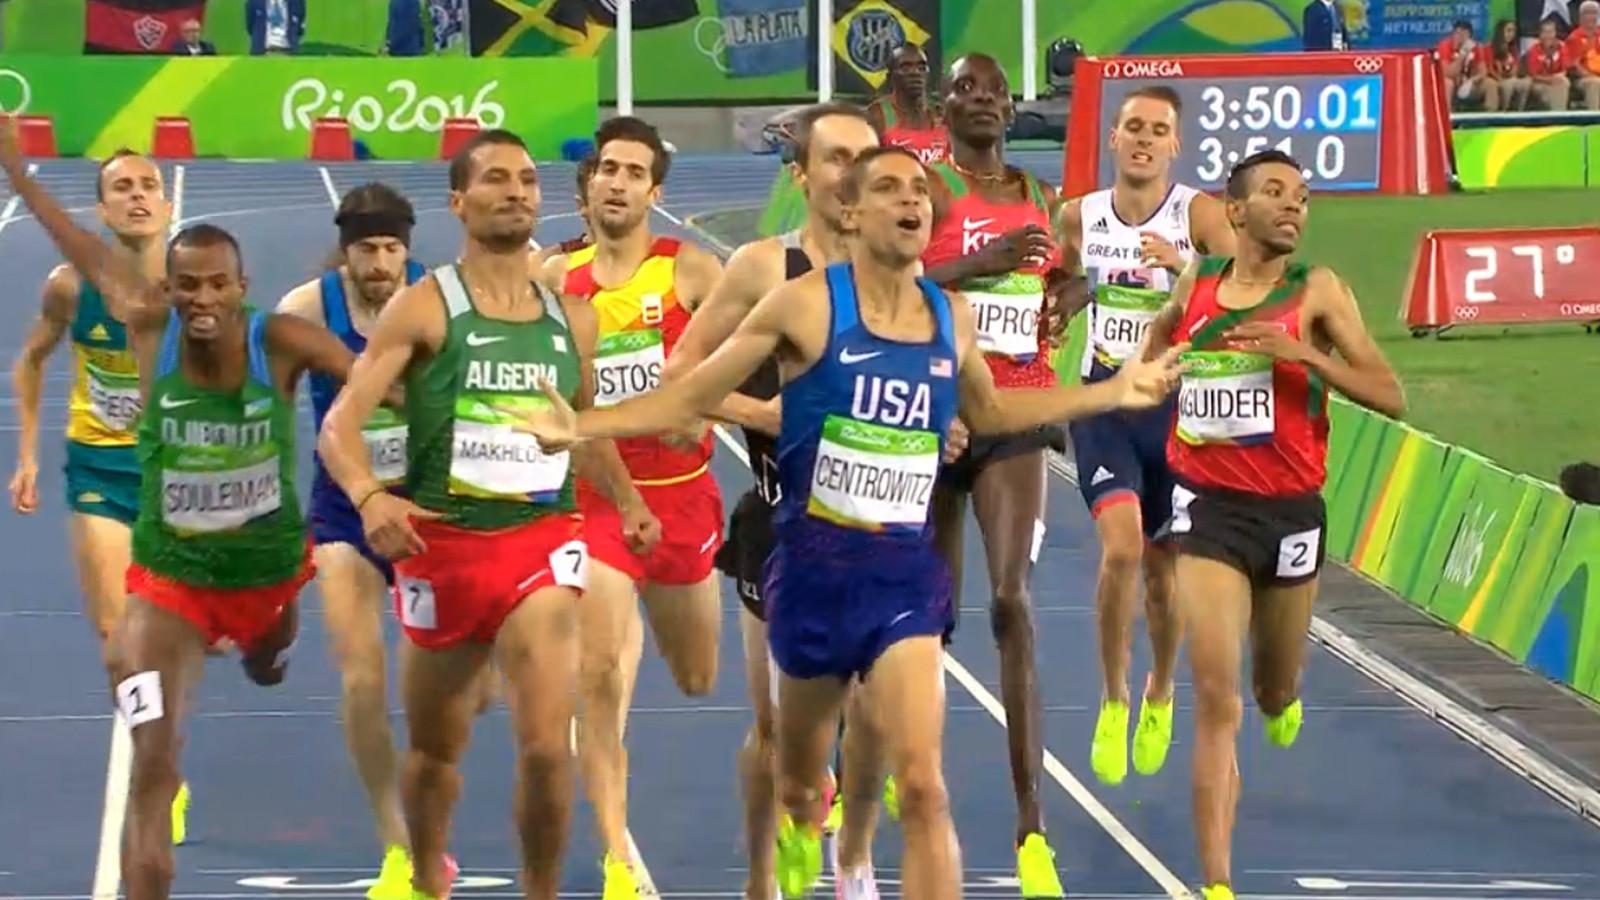 Olympics 2016 Team Usa S Matthew Centrowitz Shocks To Win